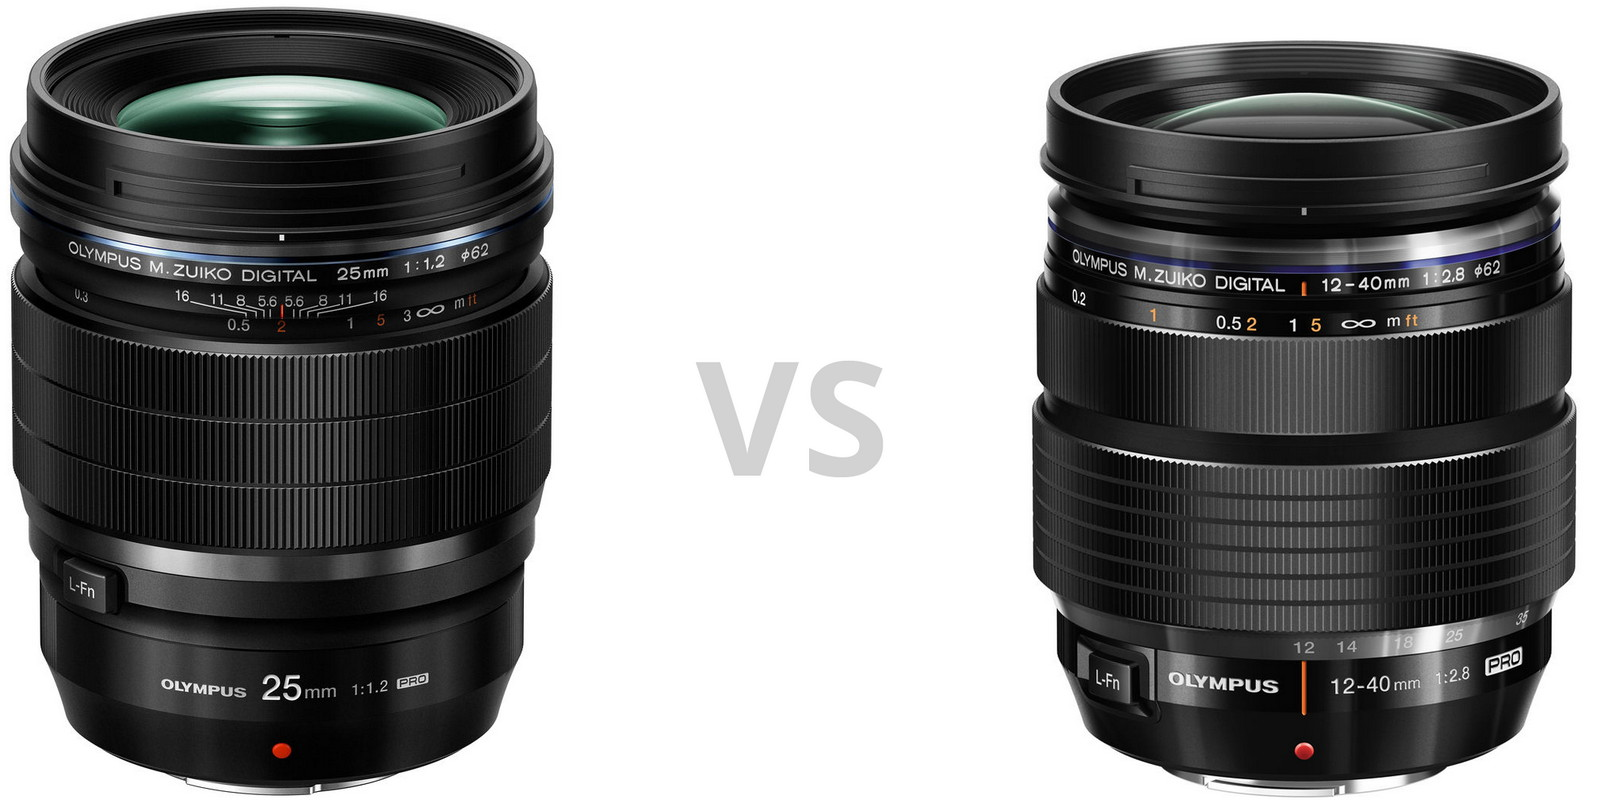 Olympus 25mm f/1.2 Pro и Olympus 12-40mm f/2.8 Pro